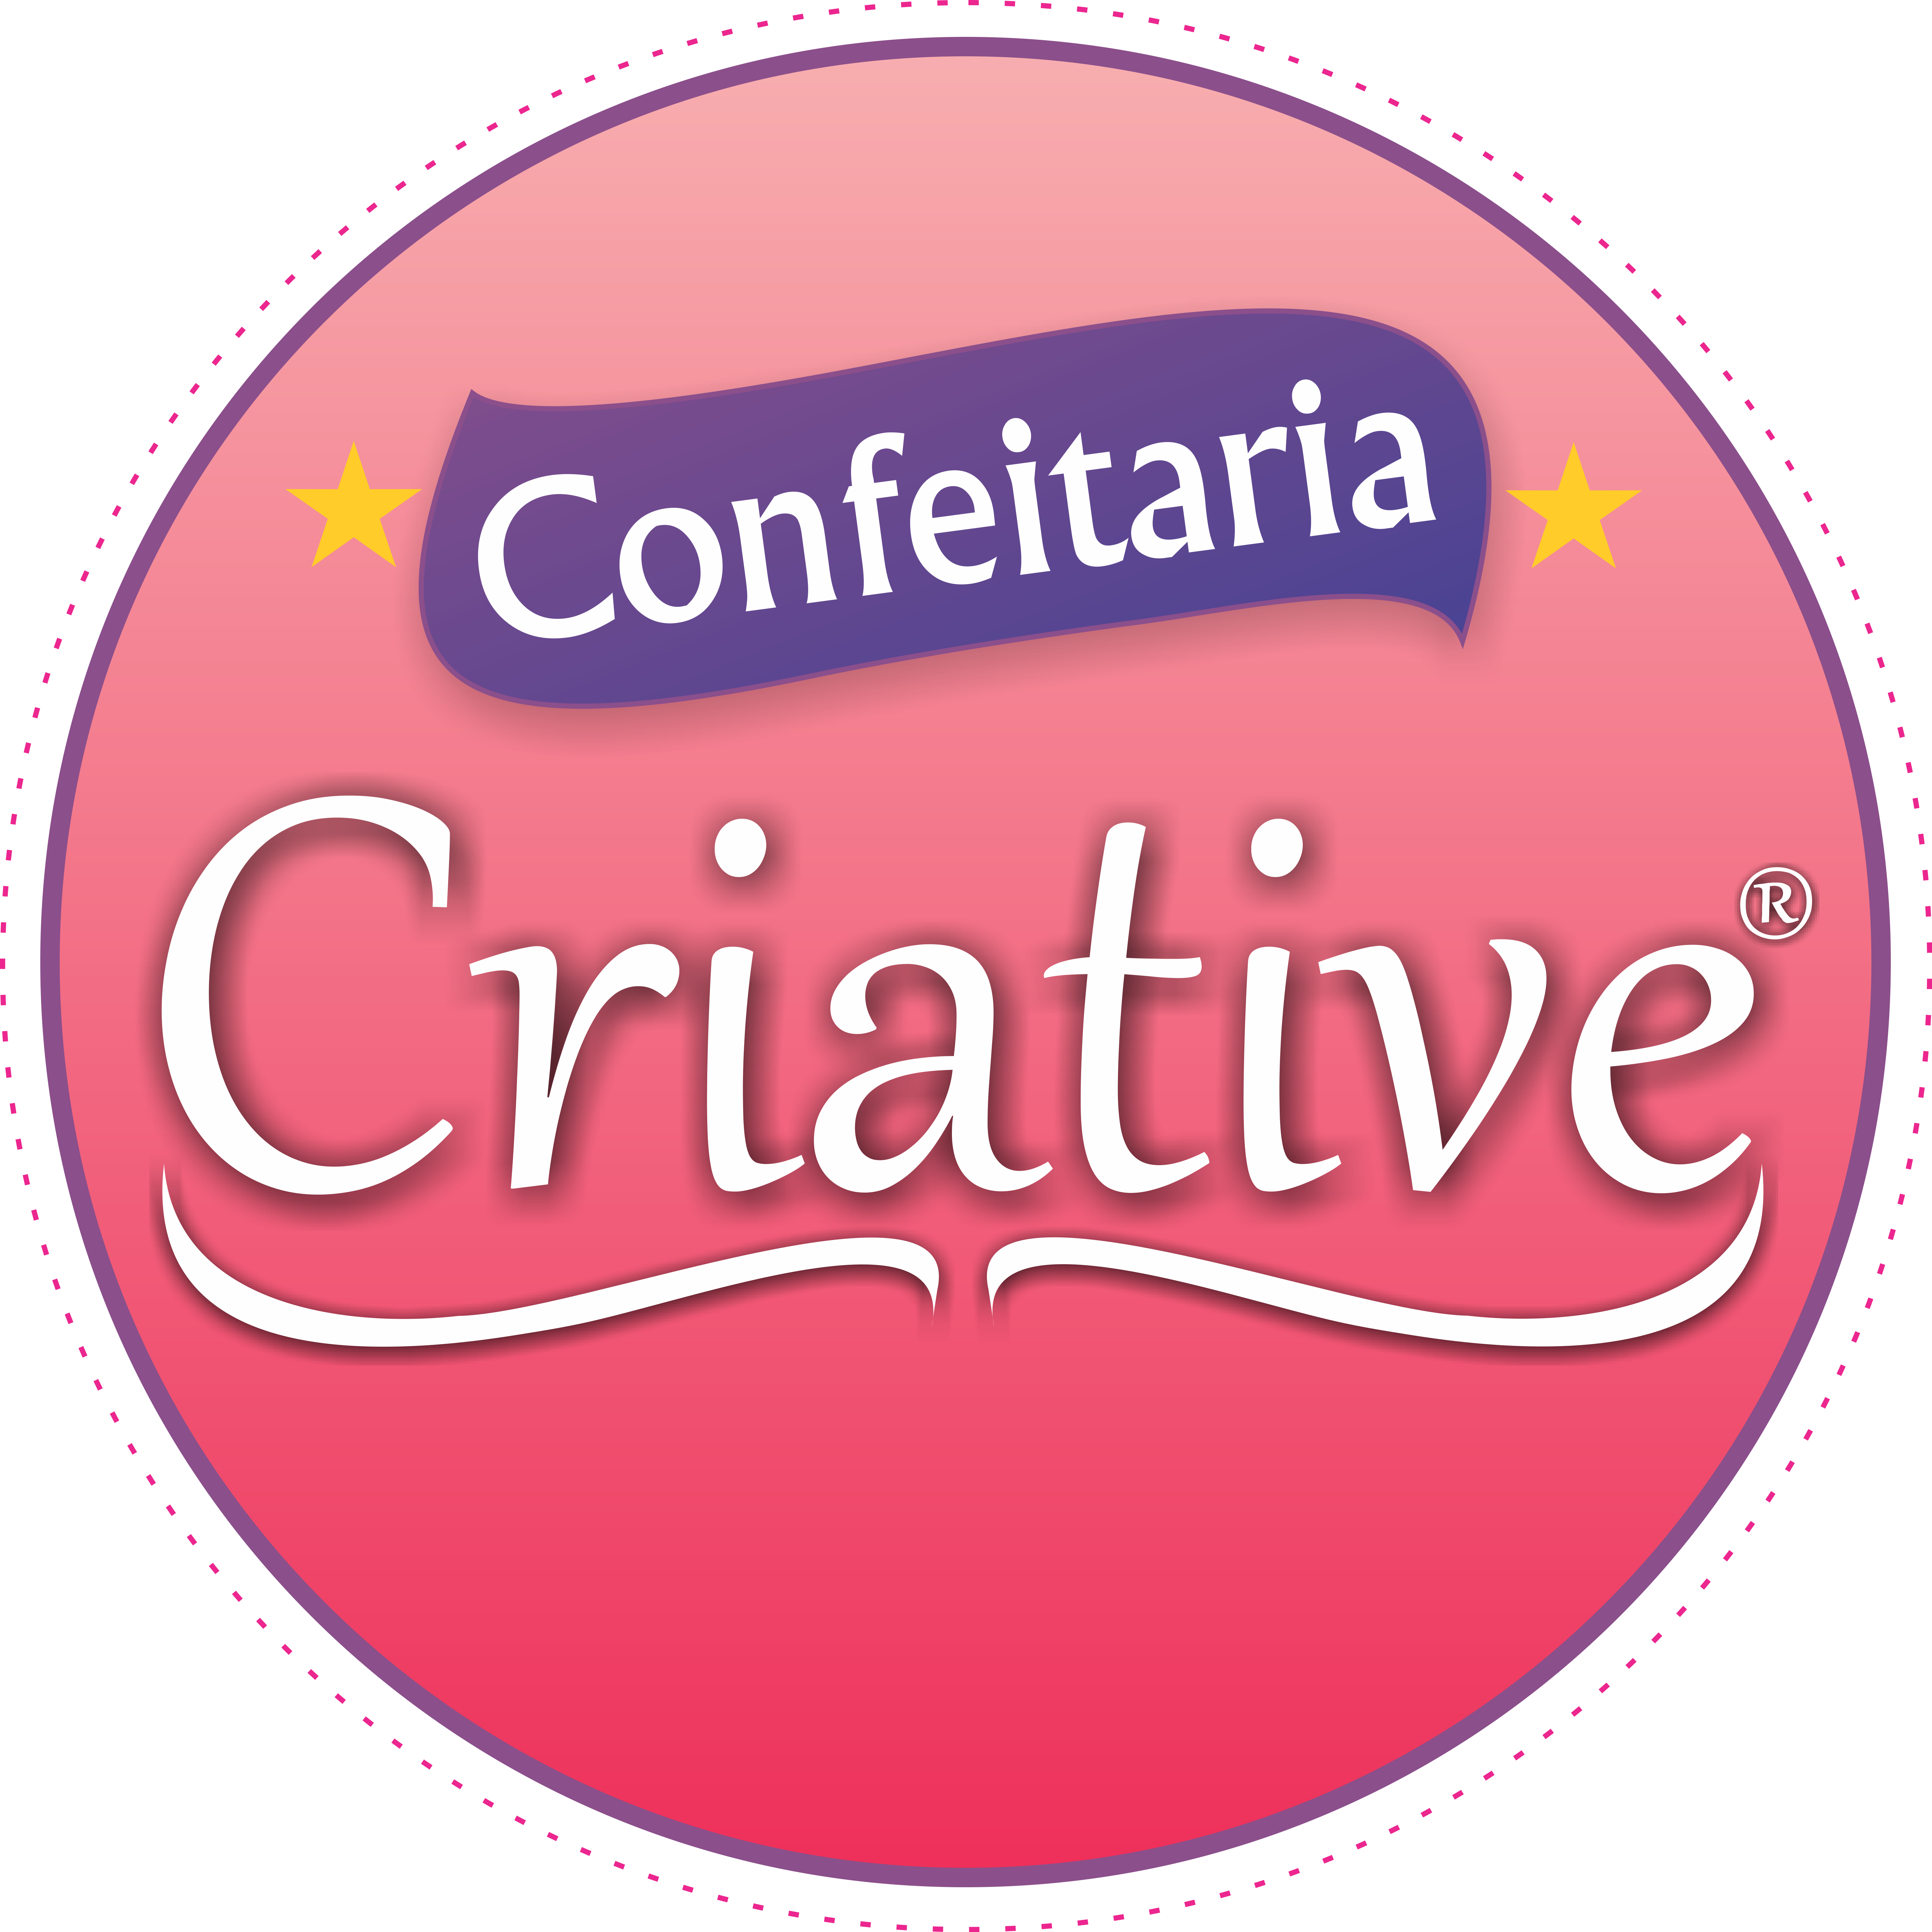 Confeitaira criative